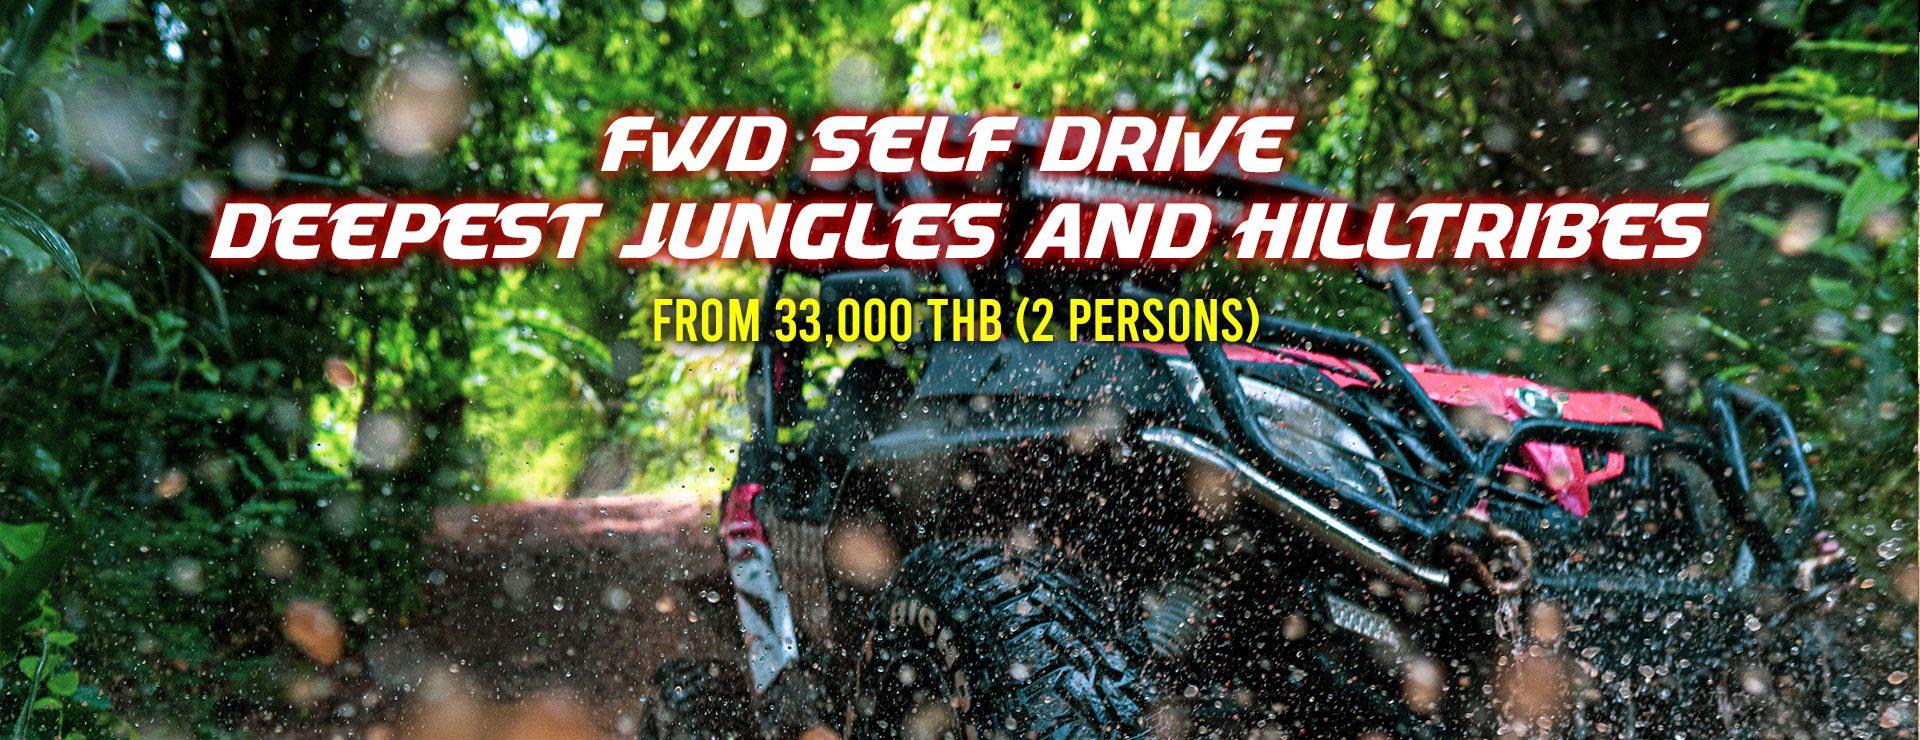 fwd jungle hilltribe